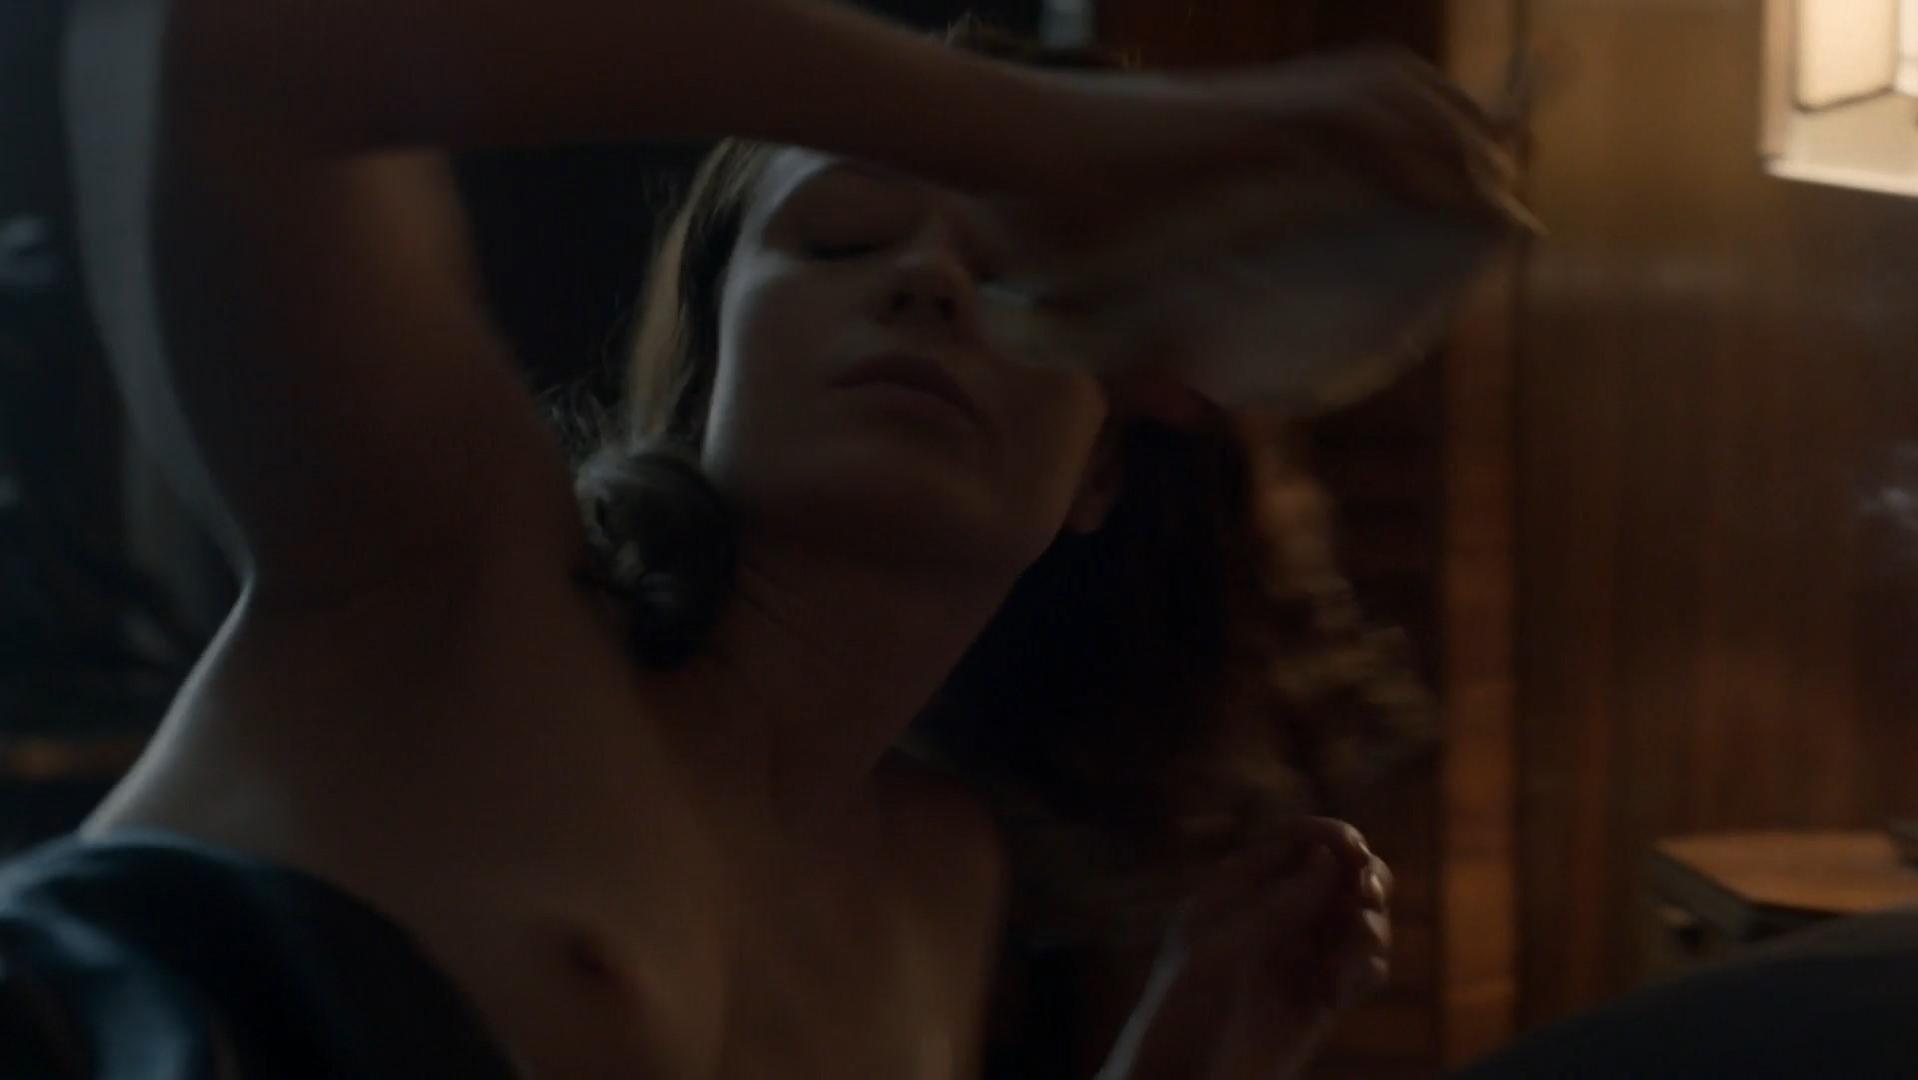 Maeve Dermody nude, Susannah Wise nude - SS-GB s01e01 (2017)